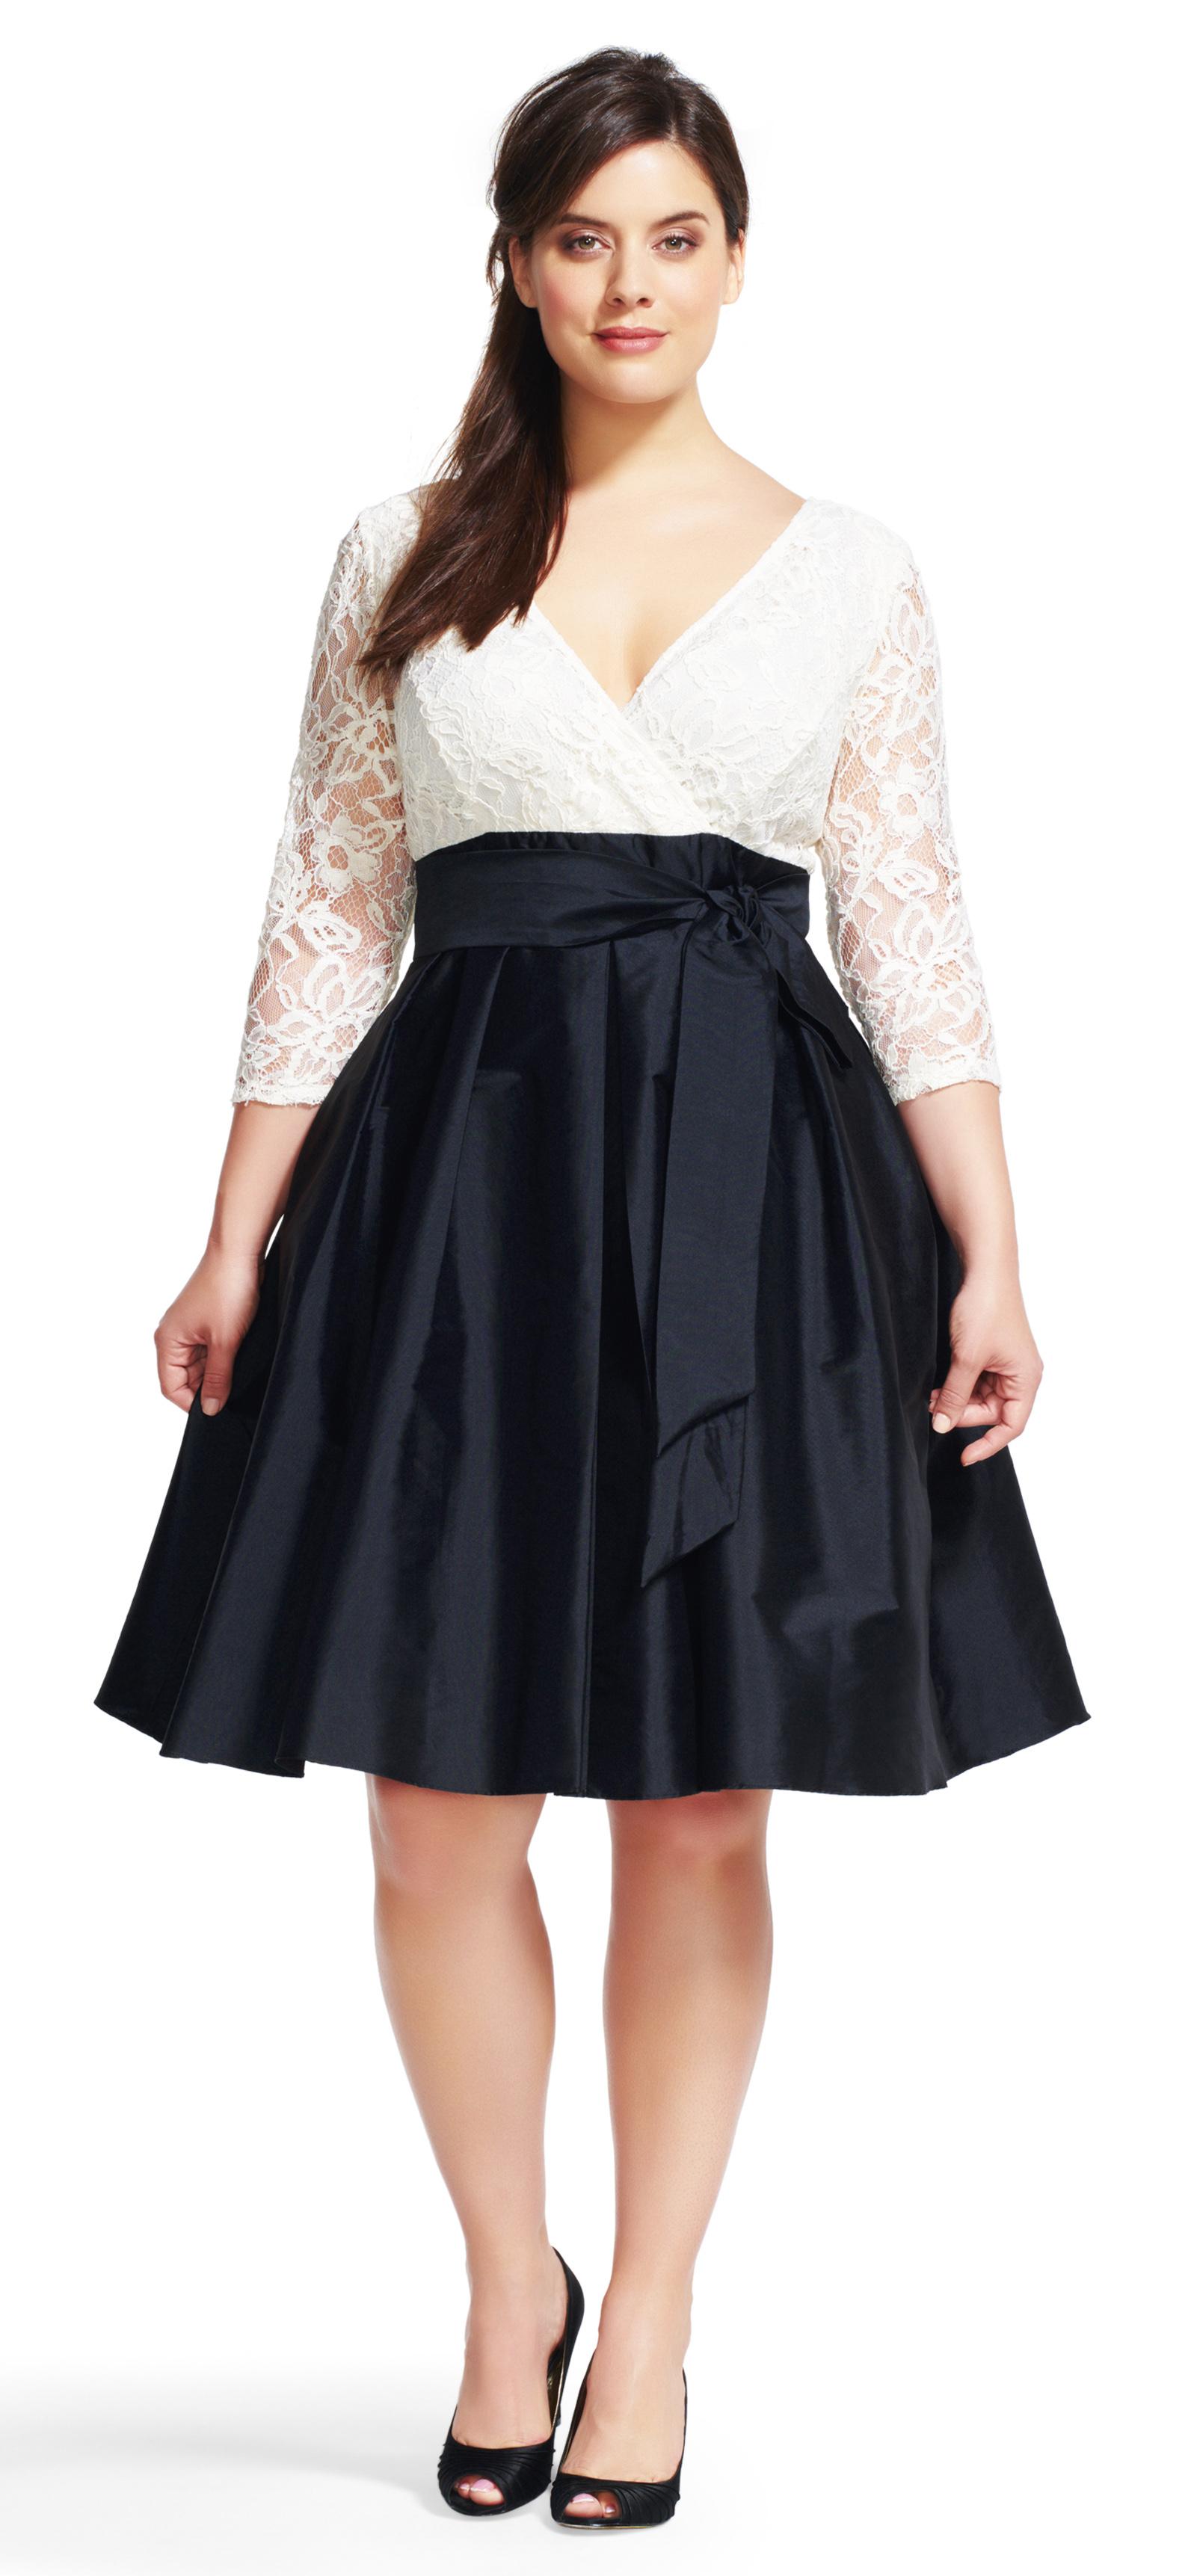 Plus size wedding guest dress sleeves alexawebb 217 13 for Plus size dresses wear guest wedding